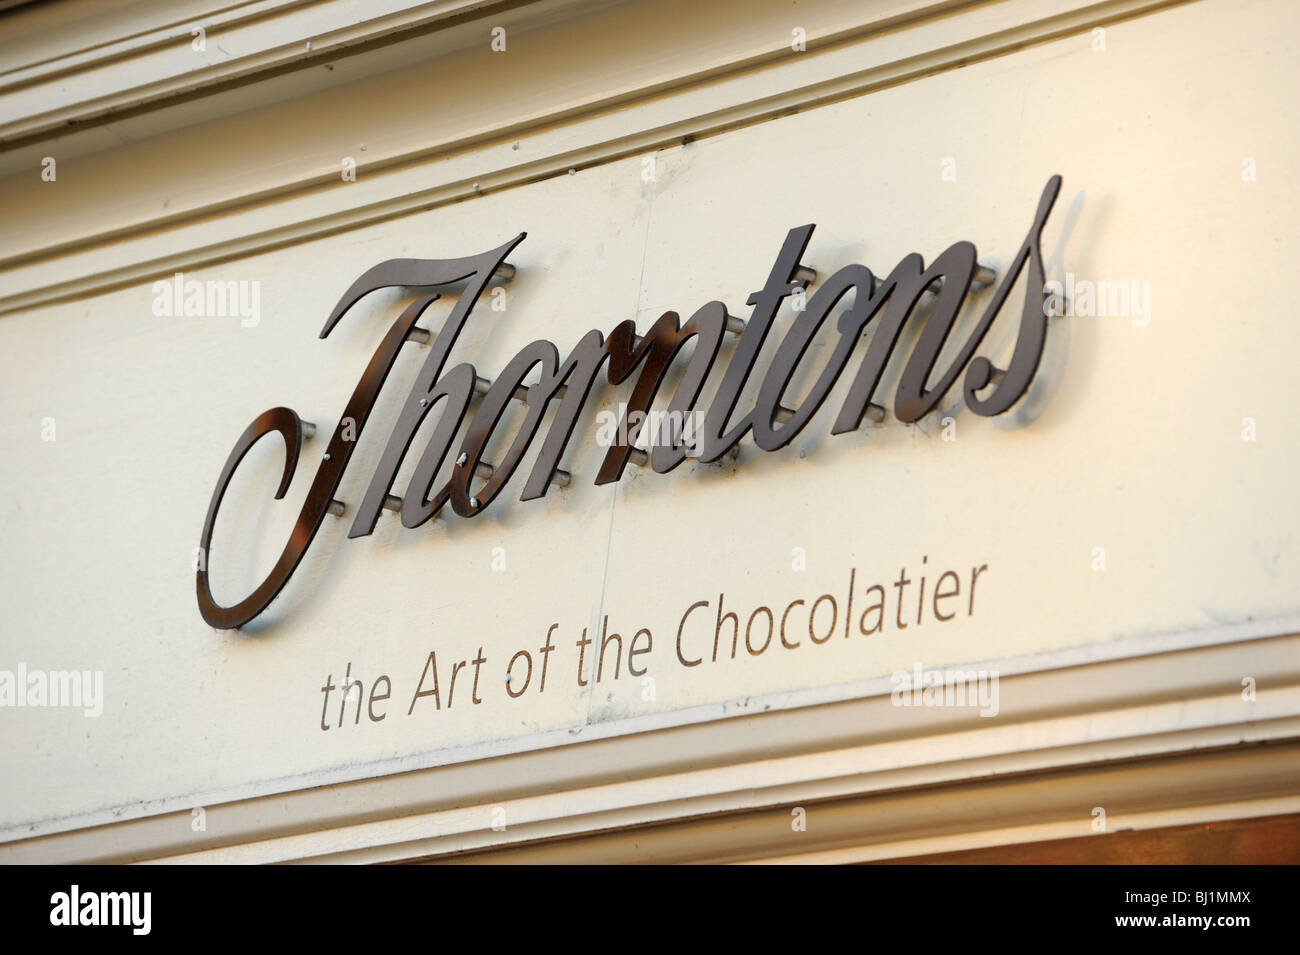 Thorntons Chocolate shop sign England Uk - Stock Image